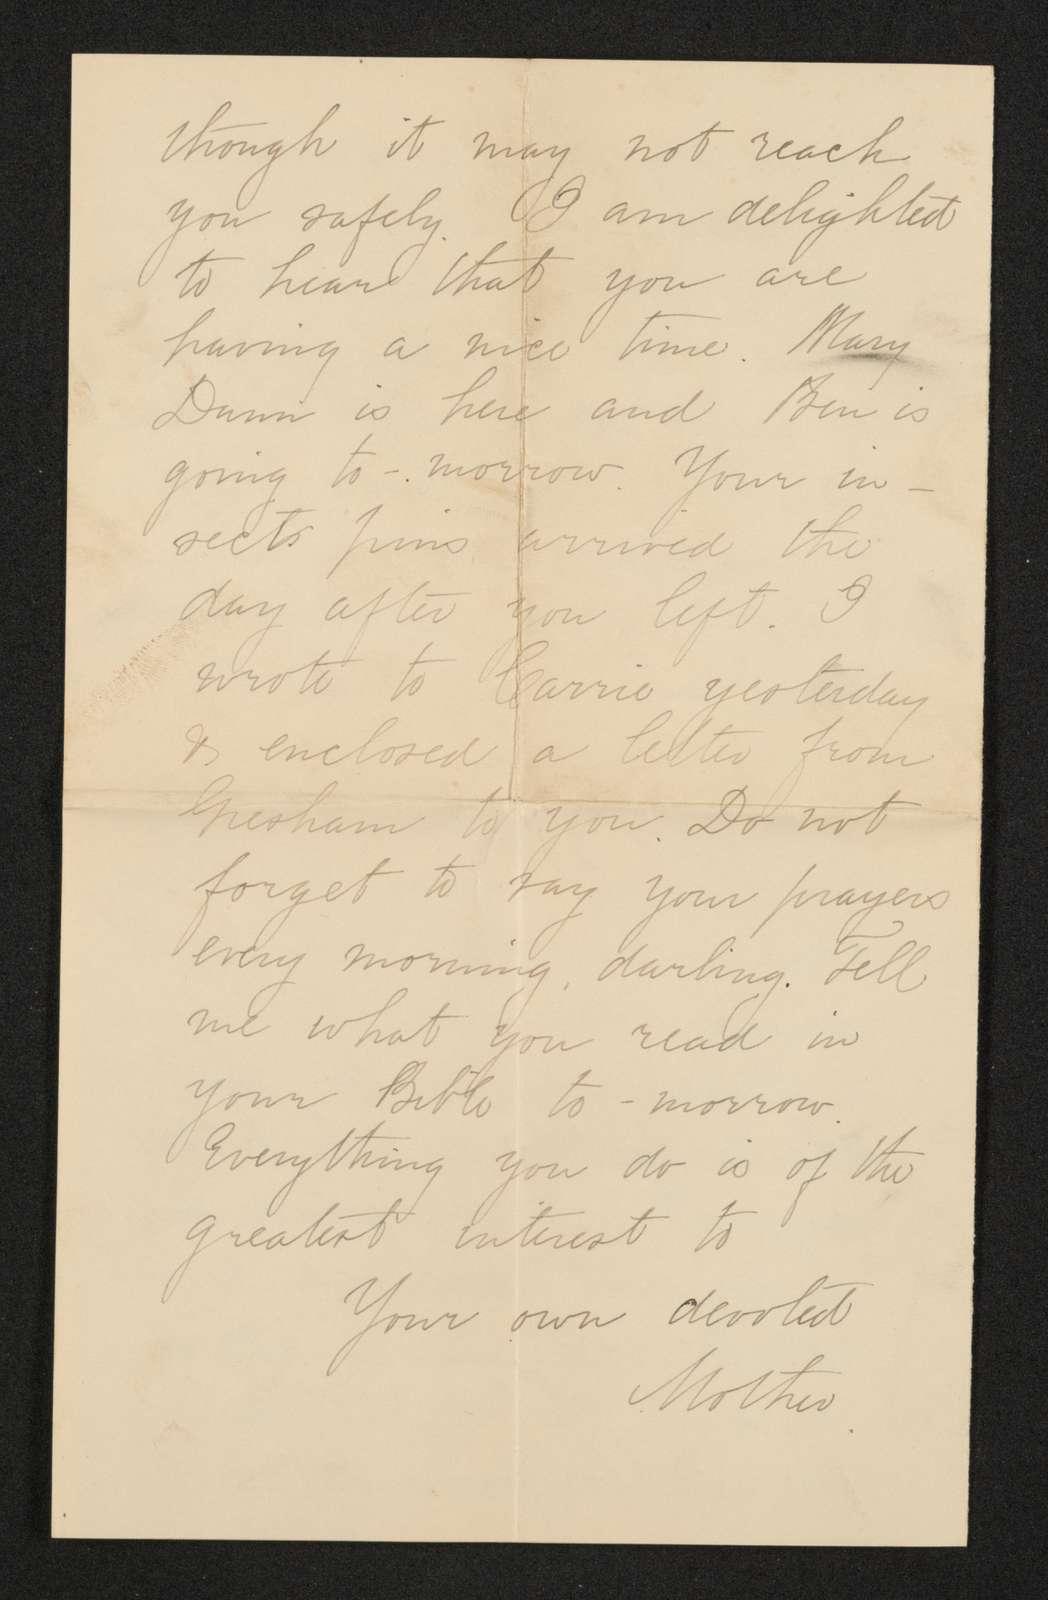 Lewis H. Machen Family Papers: Gresham Family Correspondence, 1834-1925; 1880-1899